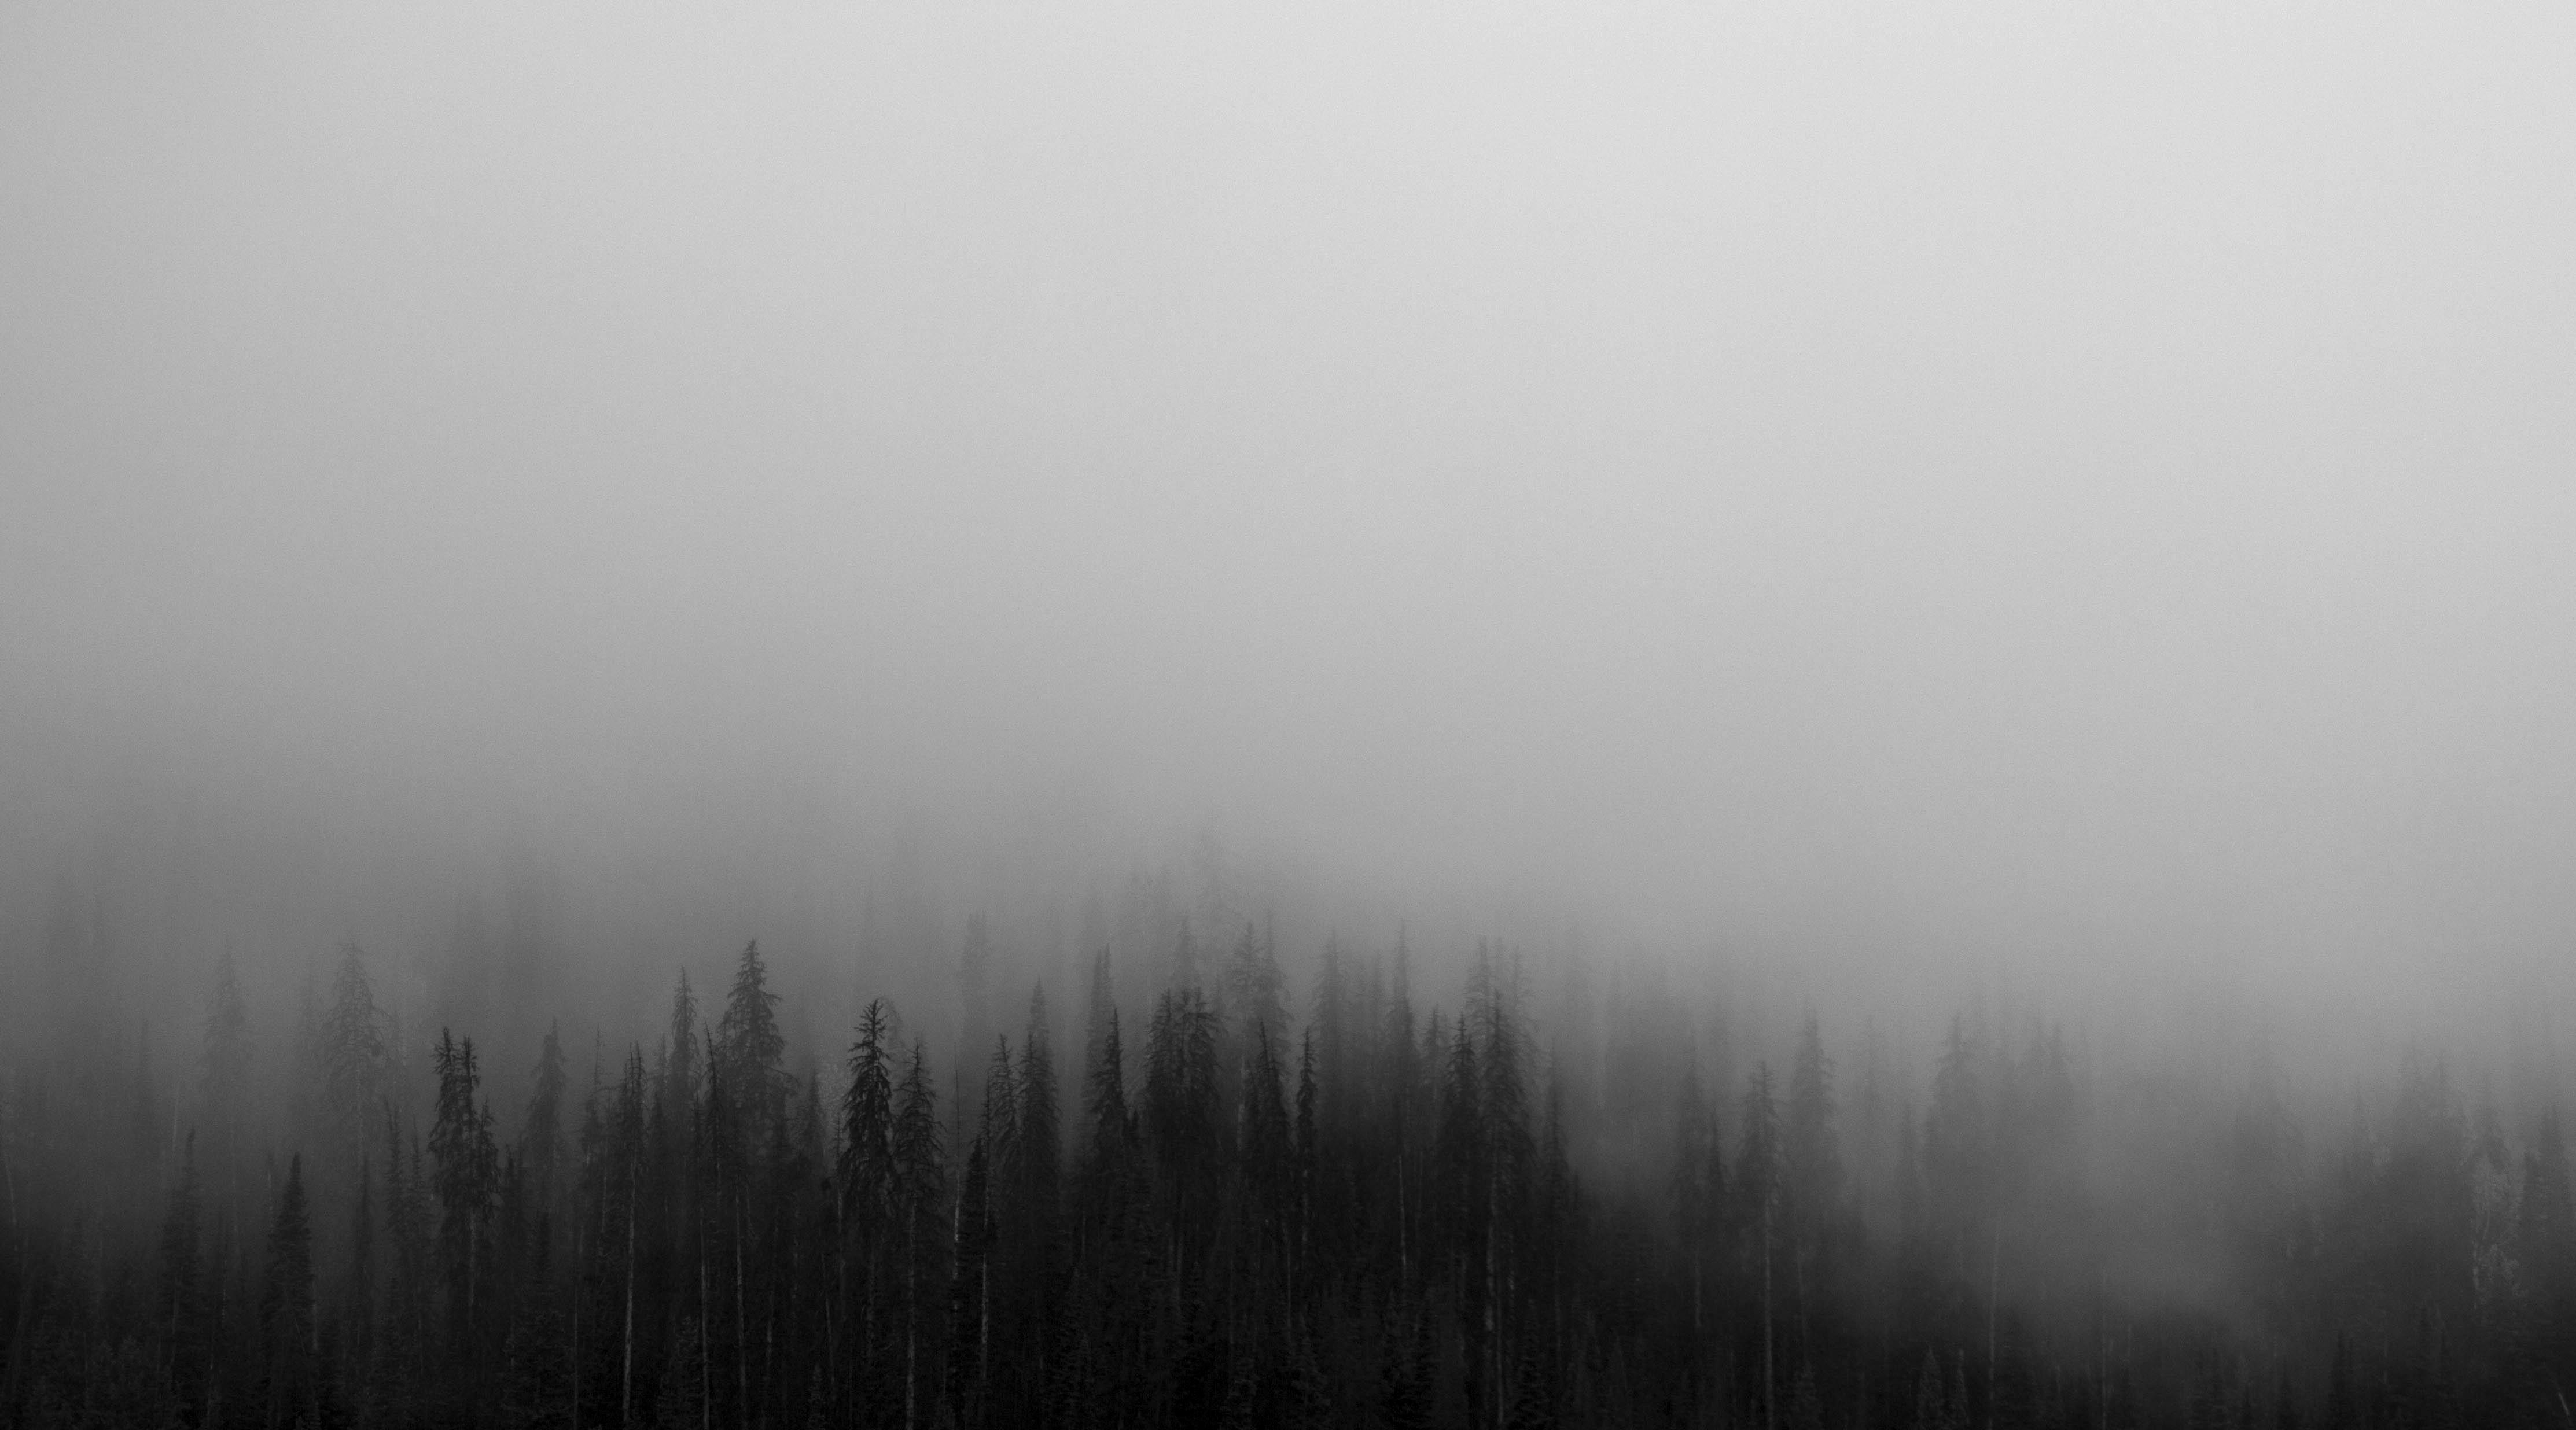 Dark Grey Forest Landscape The Paranormal Scholar